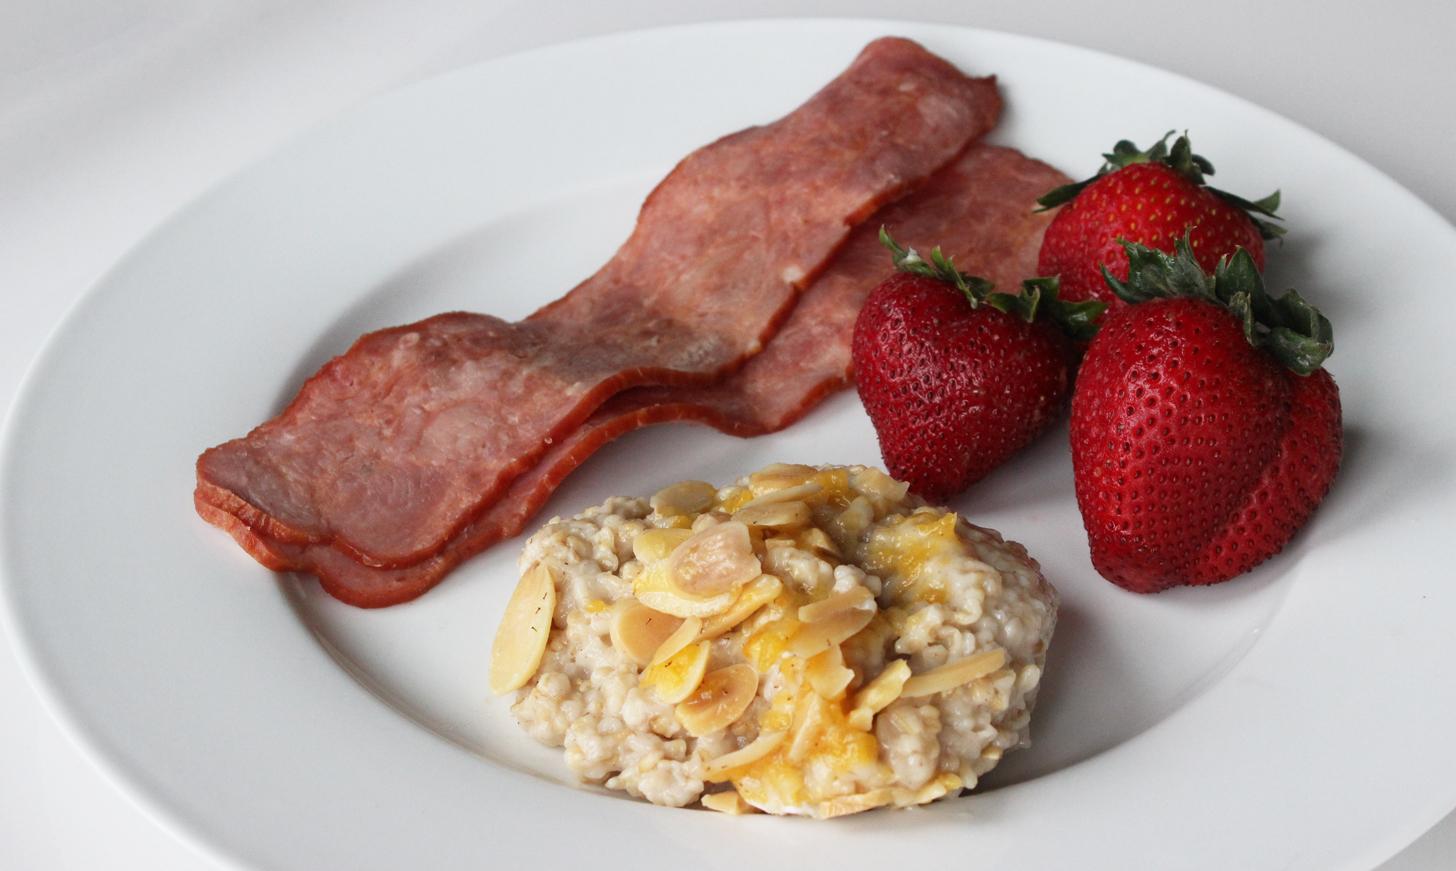 Day Two Breakfast: Winning Combination